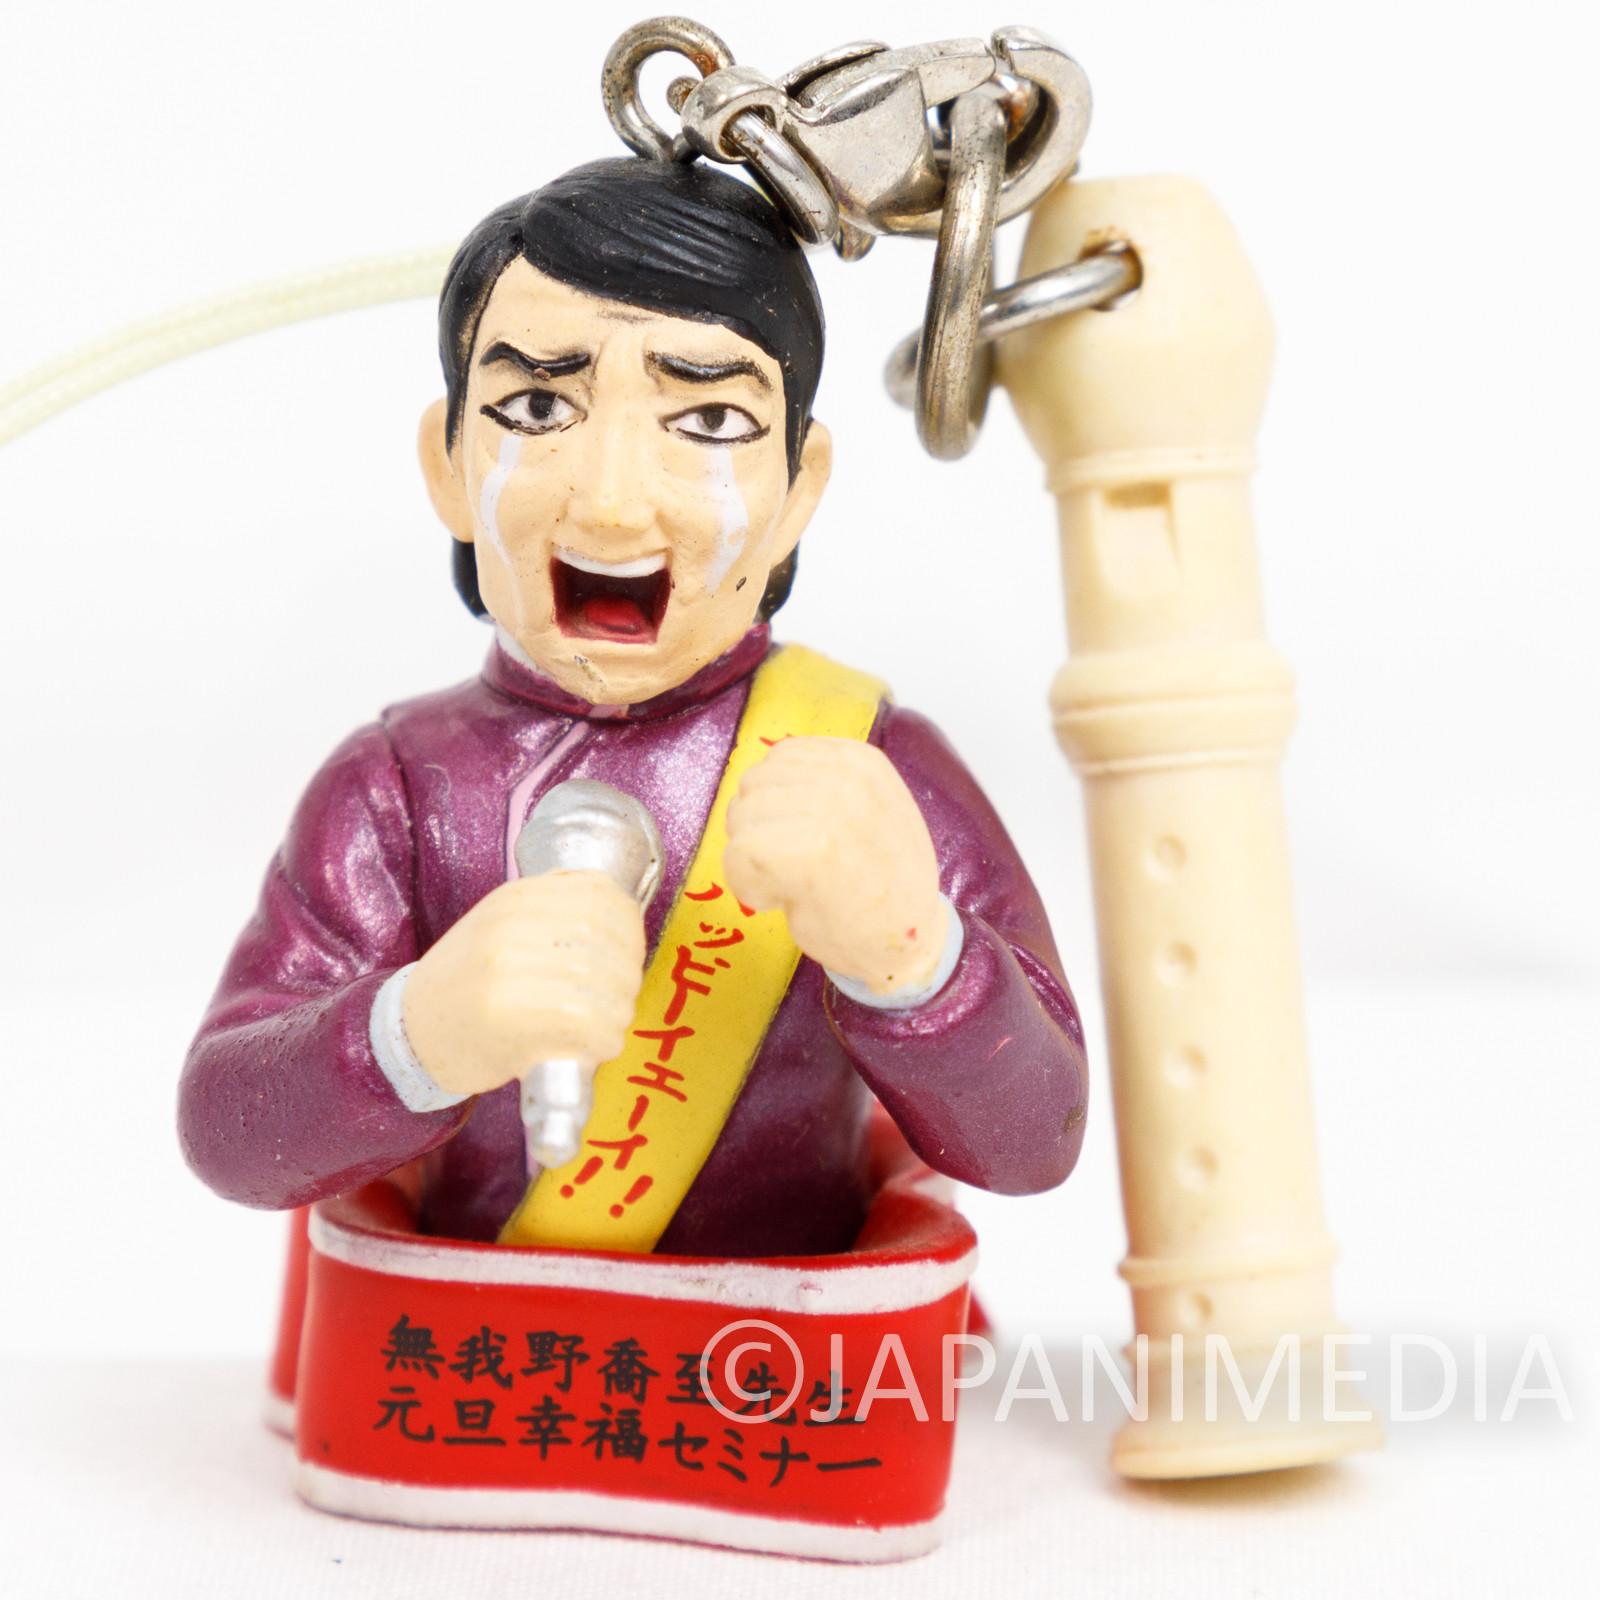 Pyu to Fuku! Jaguar Kyochi Mugano Figure Strap JAPAN ANIME